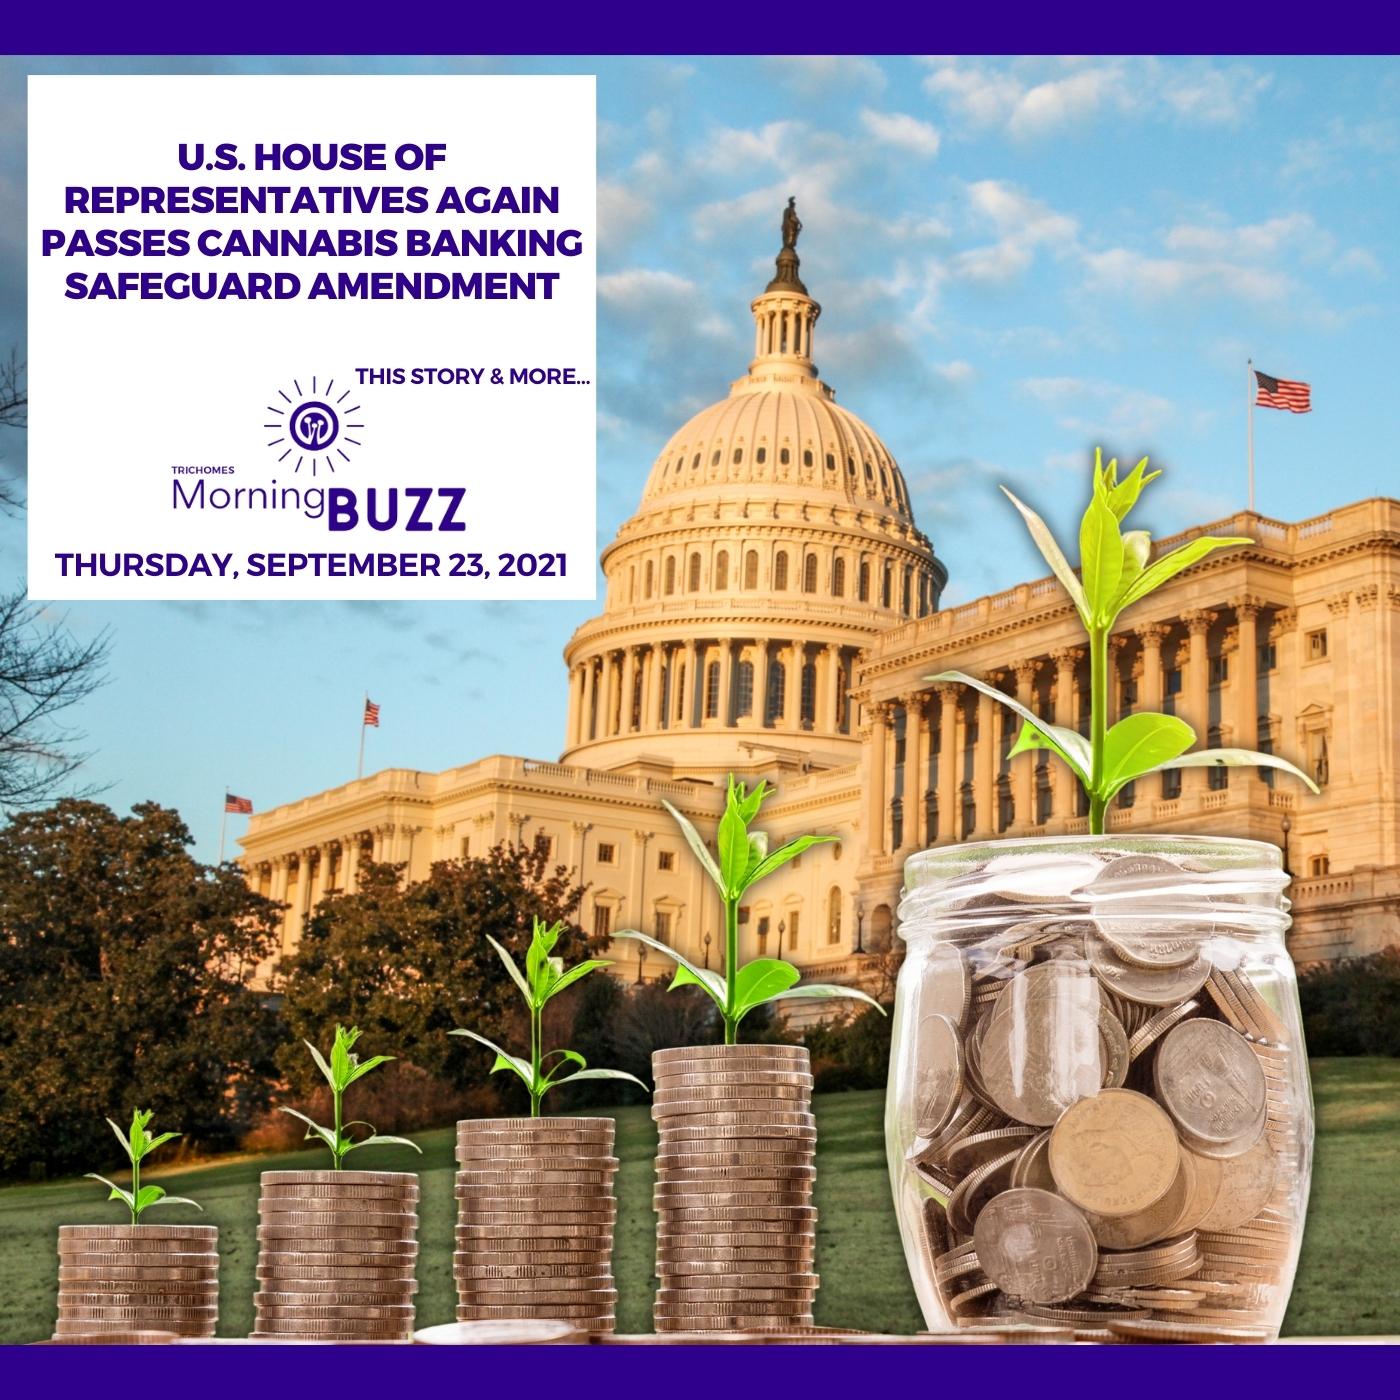 U.S. House Of Representatives Again Passes Cannabis Banking Safeguard Amendment show art